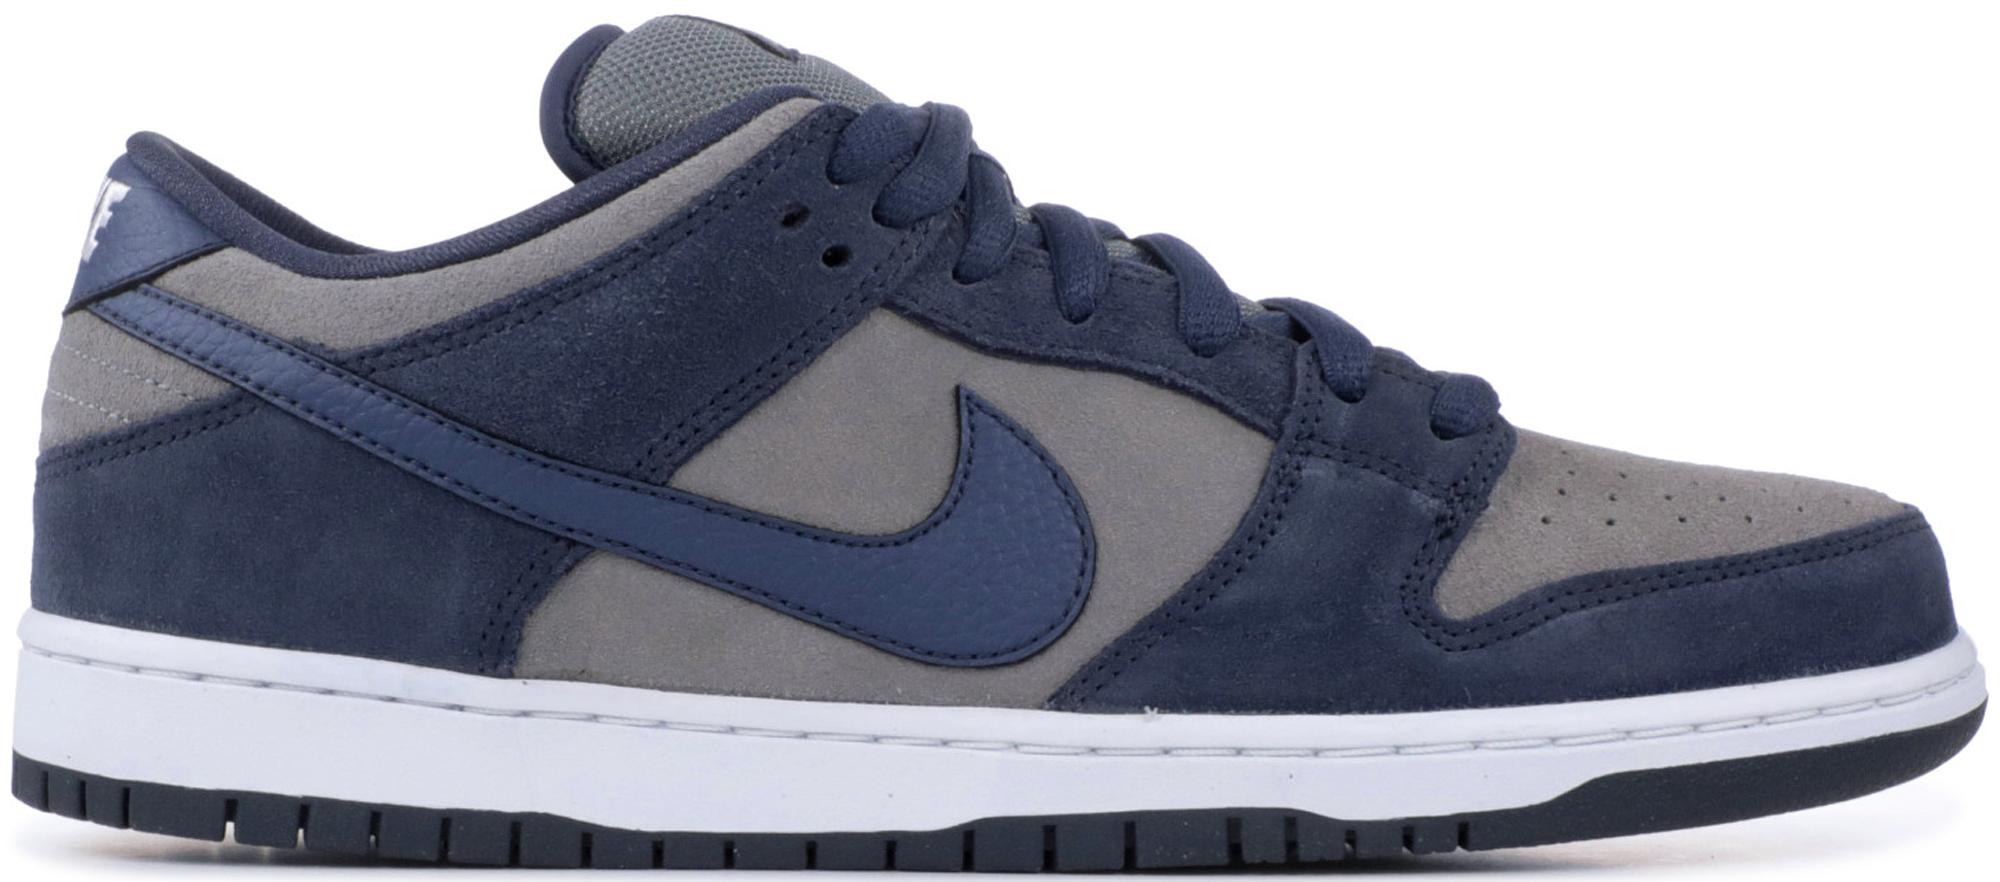 Nike SB Dunk Low Thunder Blue Cool Grey